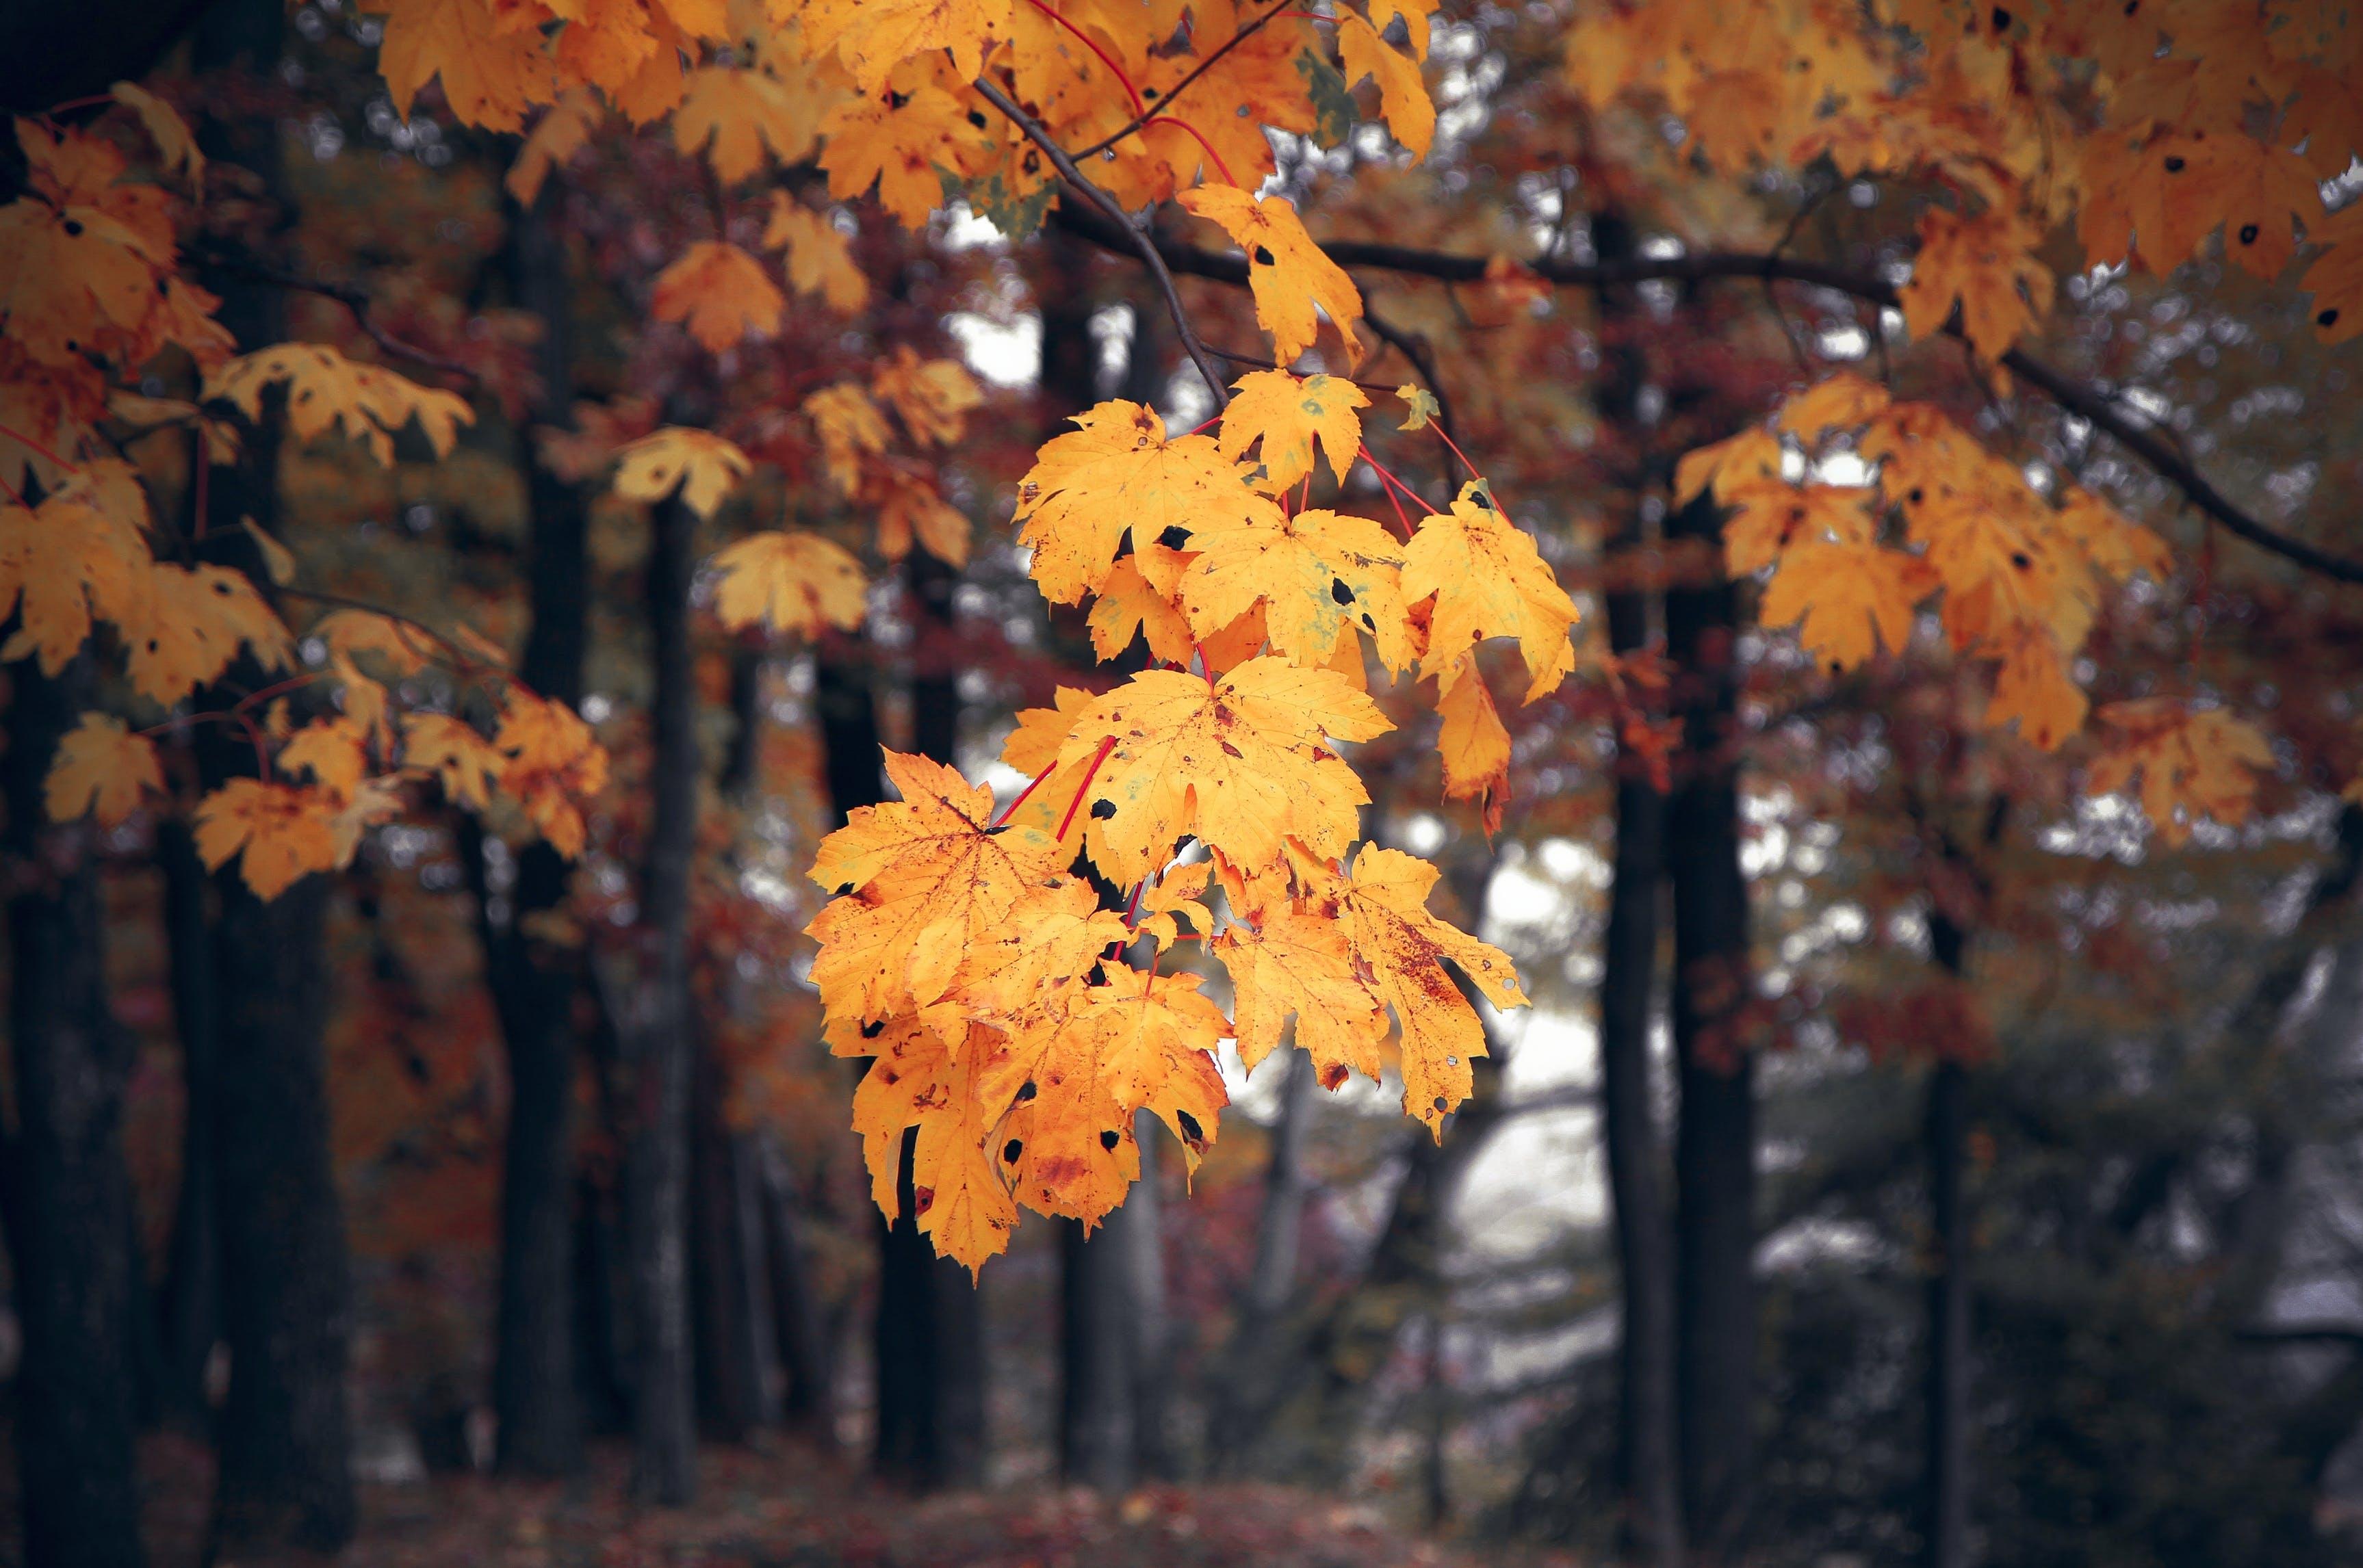 autumn, autumn colours, autumn leaves